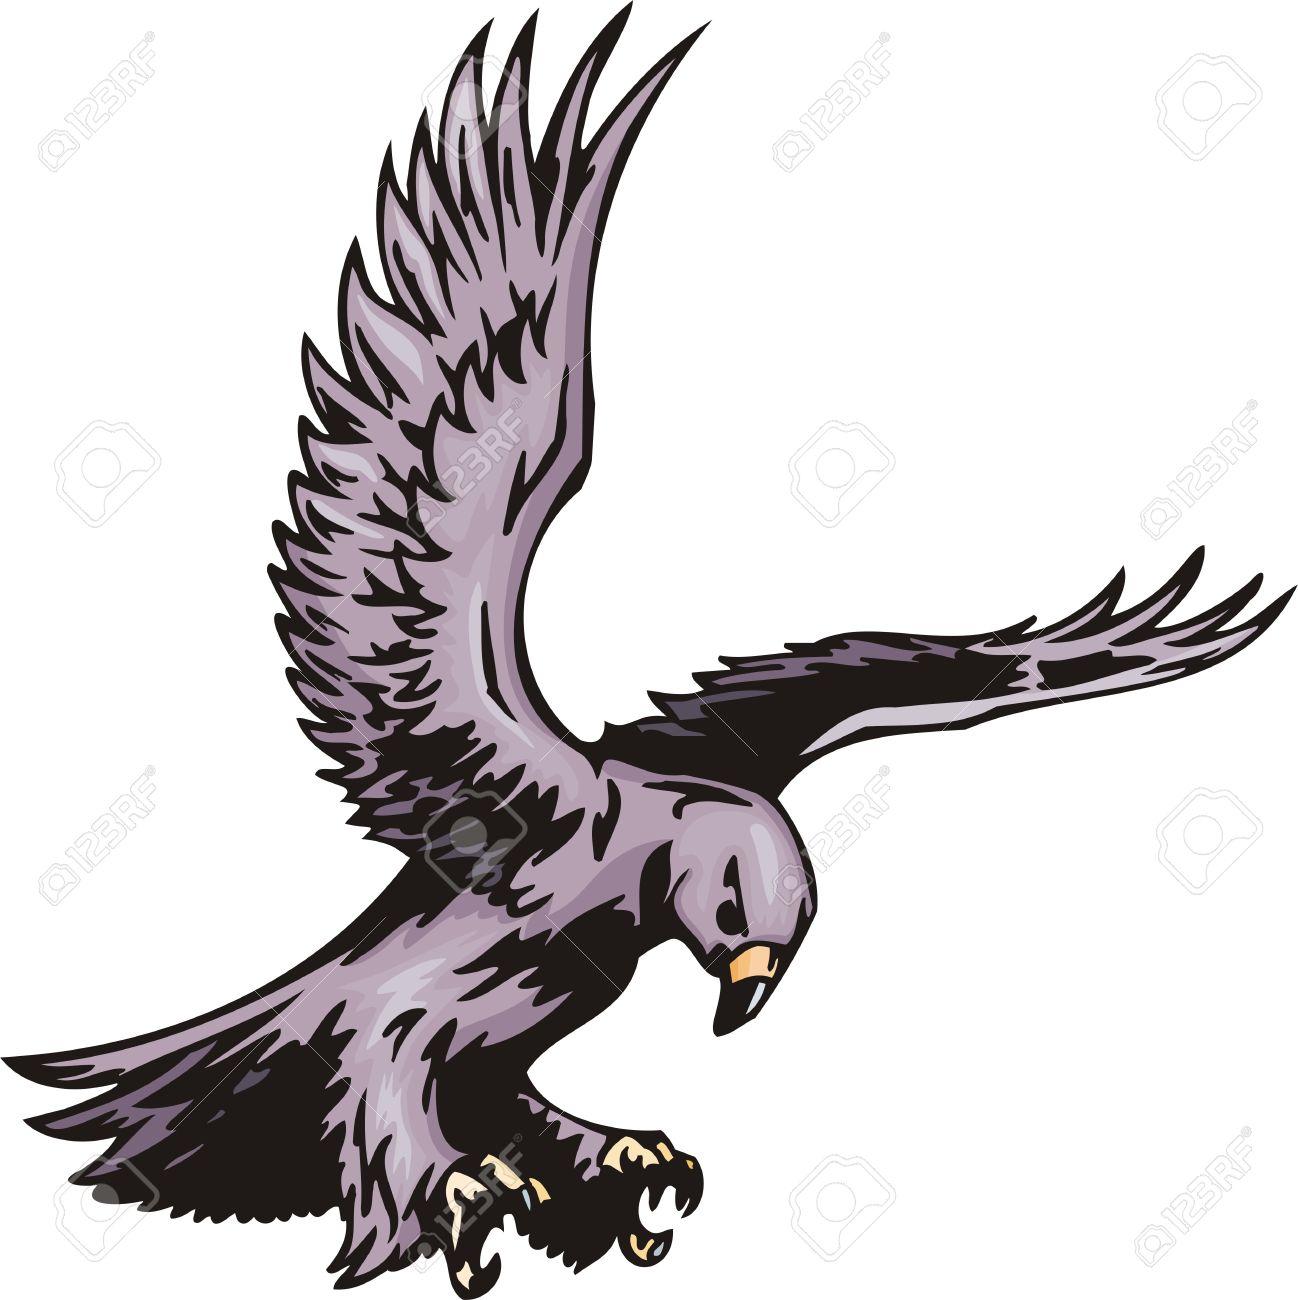 The Goshawk With Violet Plumage. Predatory Birds. Illustration.